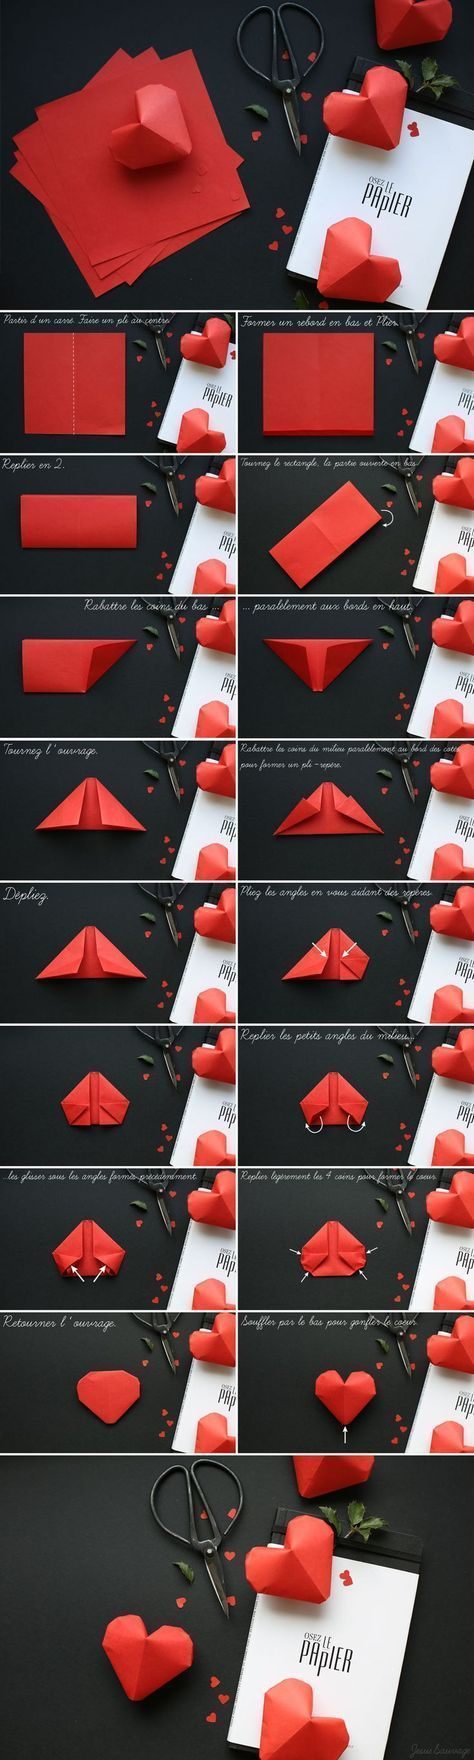 Elegant Best Origami Tutorials - Pump Origami - Easy DIY Origami Tutorial Projects to G .Elegant Best Origami Tutorials - Pump Origami - Simple DIY Origami Tutorial Projects for . simple origami projects tutorial Make Diy Origami, Useful Origami, Origami Wedding, Wedding Card, Wedding Gifts, How To Origami, Easy Oragami, Owl Wedding, Origami Gifts